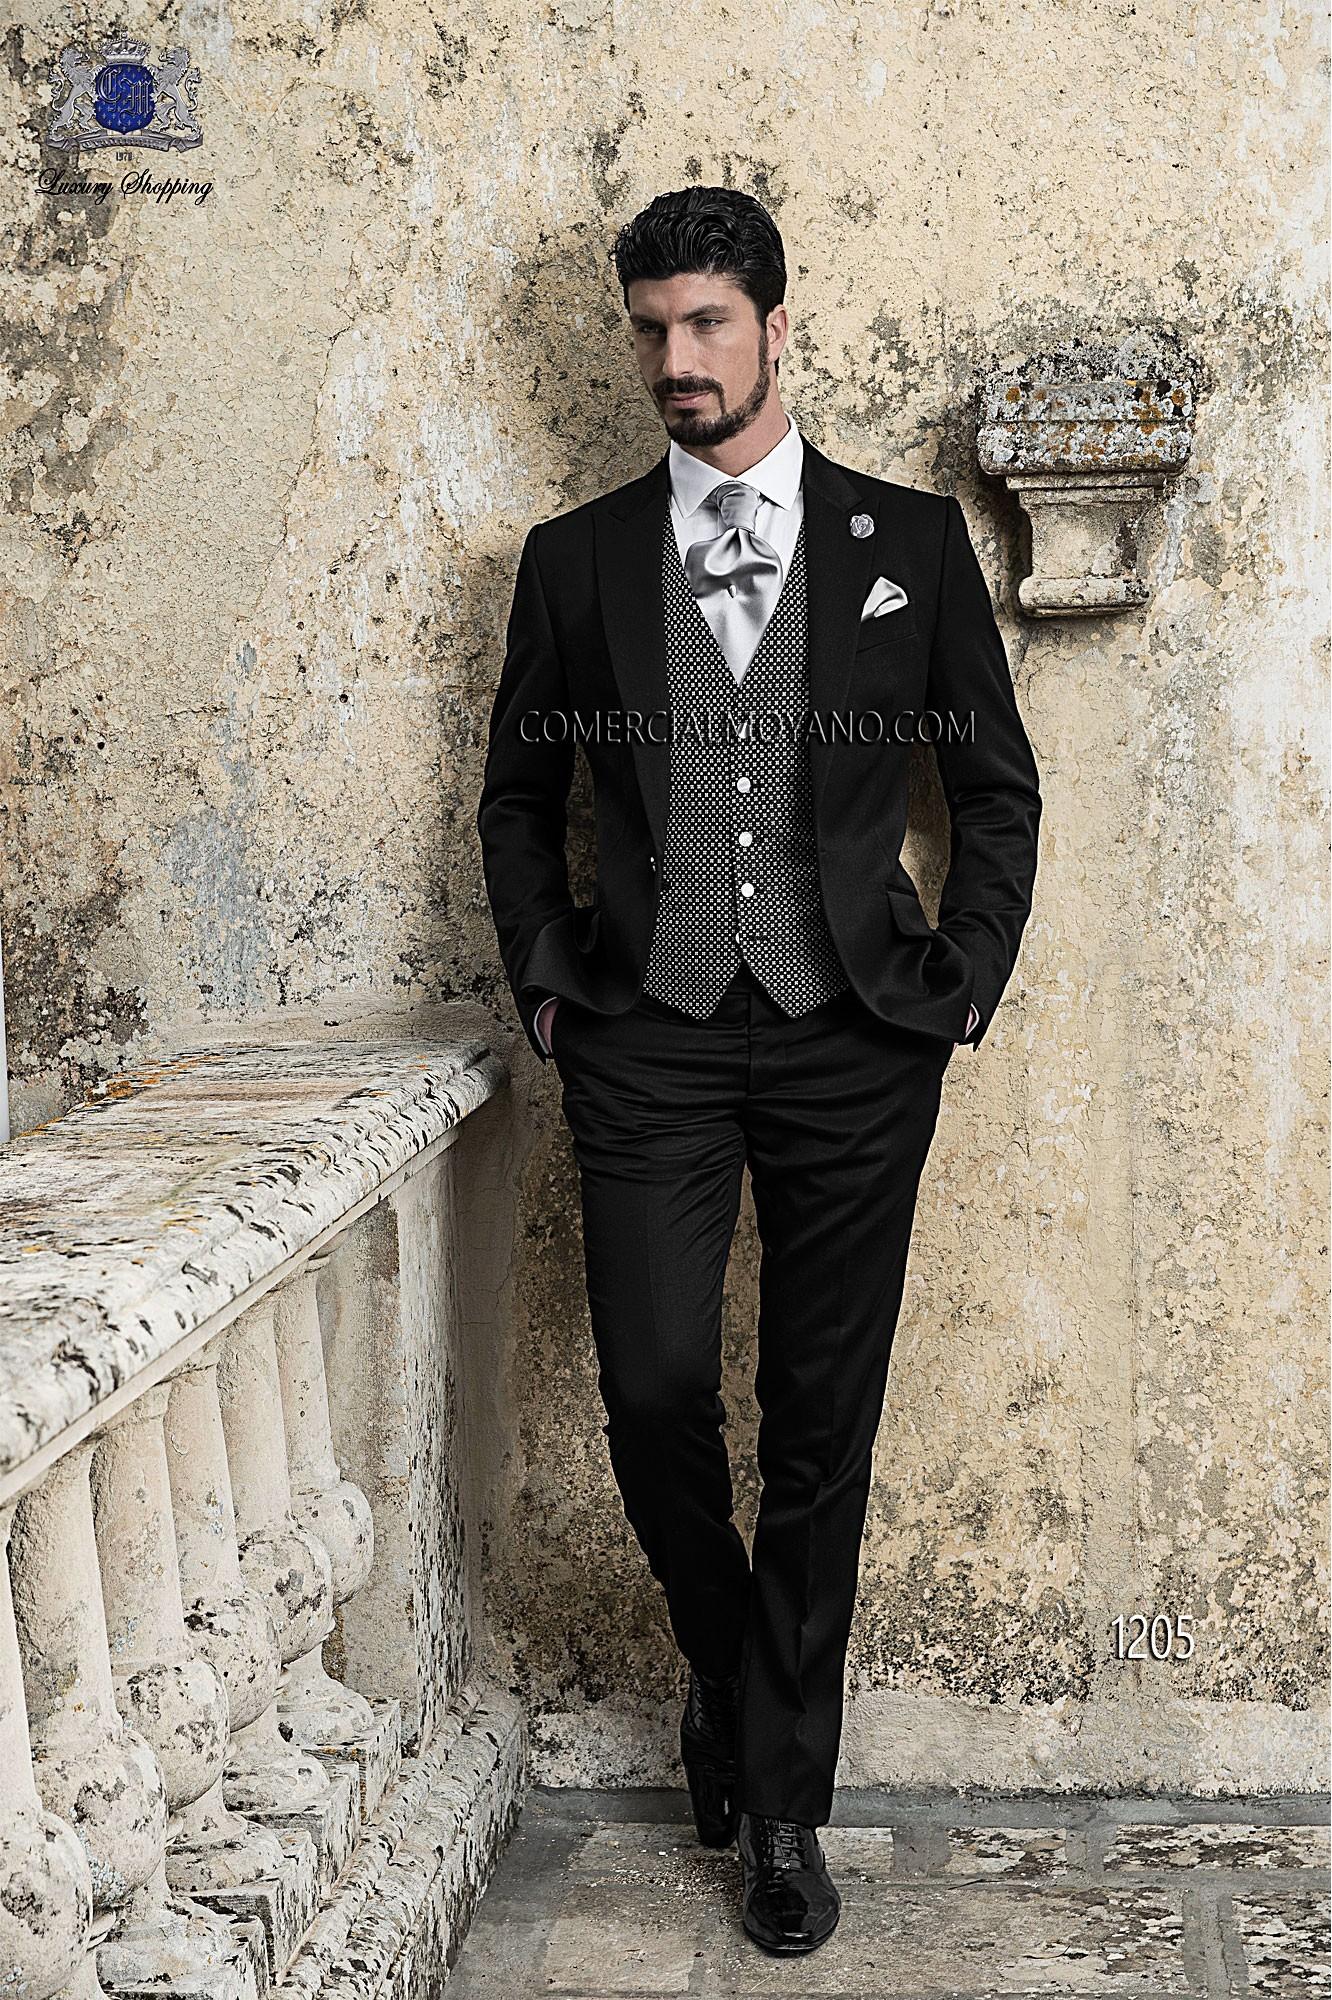 Gentleman black men wedding suit model 1205 Ottavio Nuccio Gala